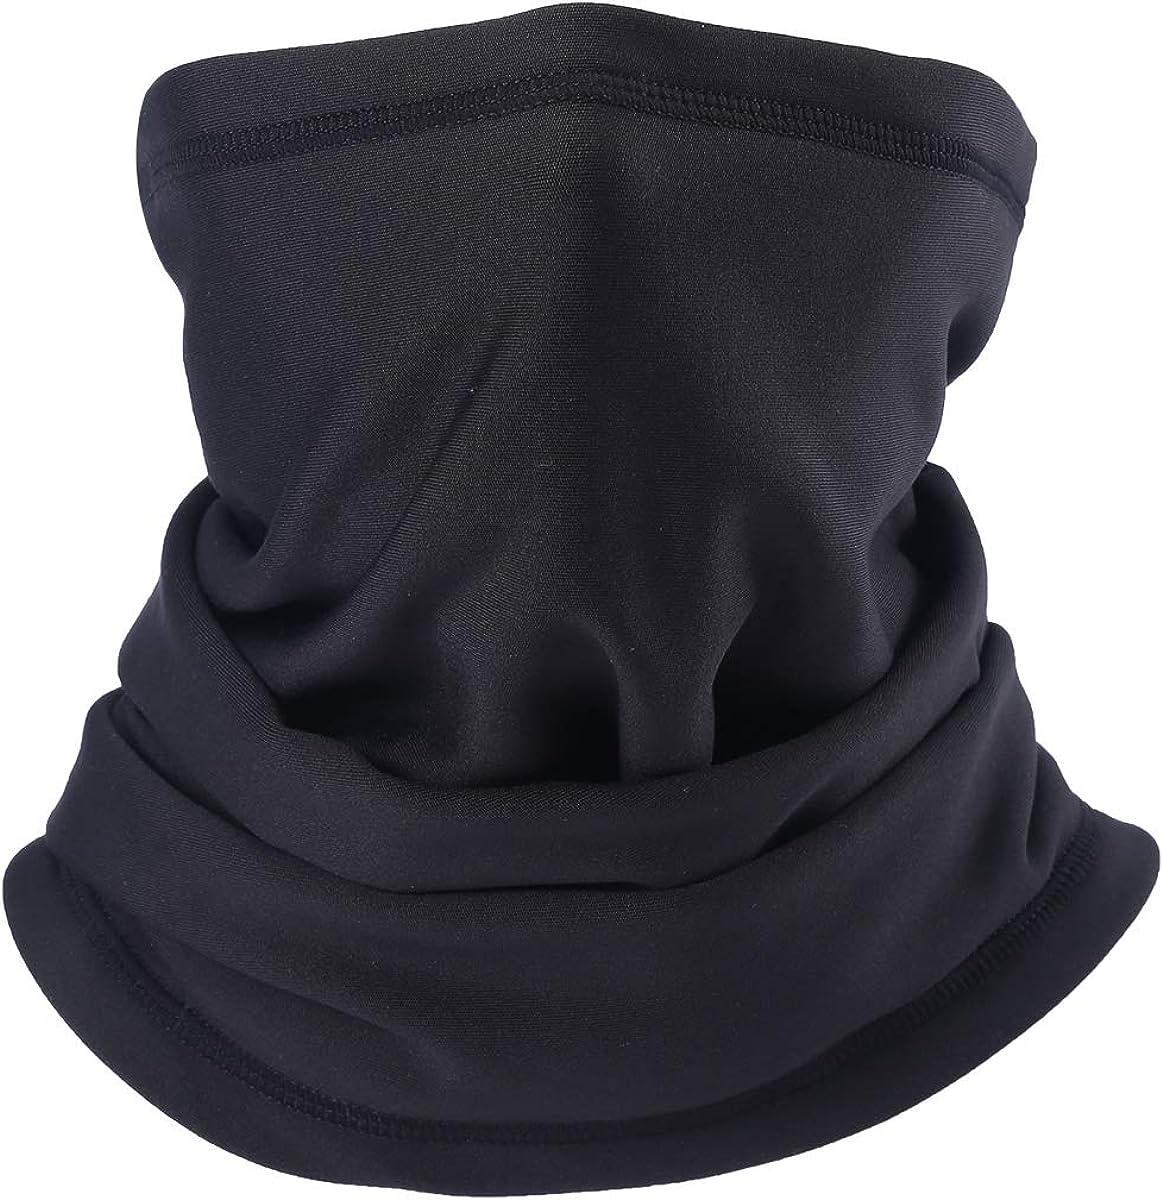 ohderii Unisex Columbus Mall Balaclava Hood Ski Face Mask 40% OFF Cheap Sale Warmer for Neck Cycl